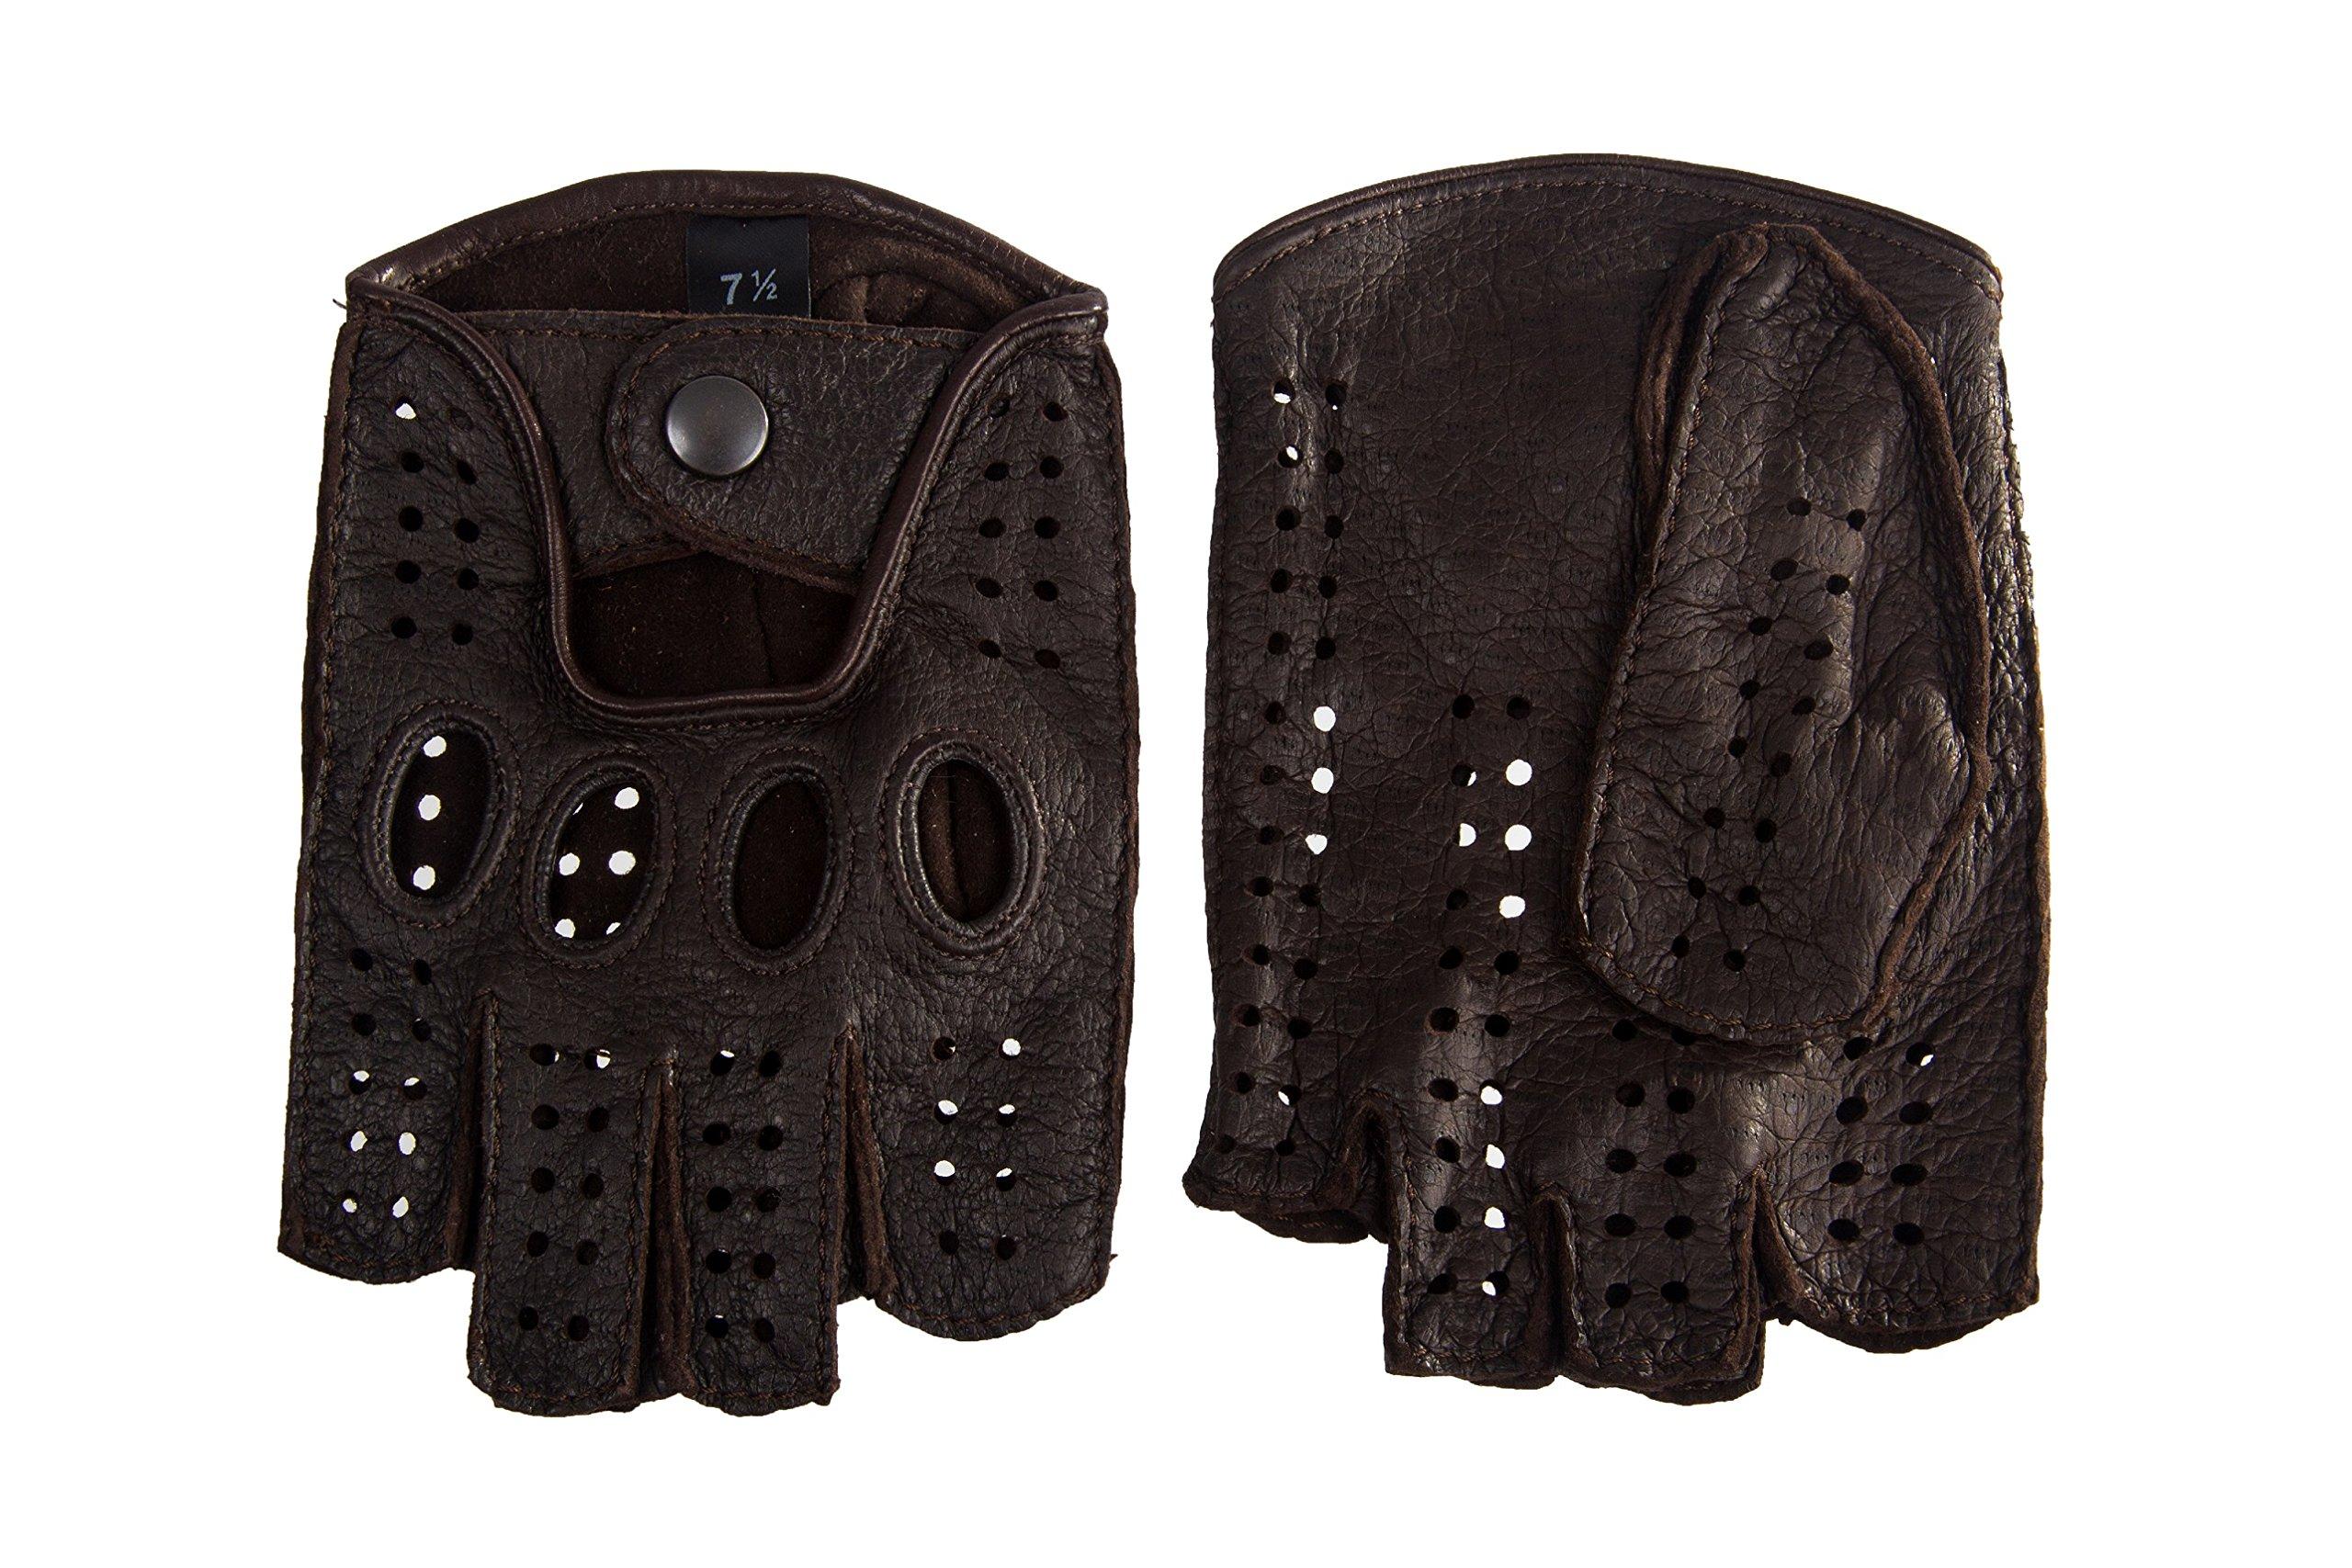 Women's Peccary Fingerless Driving Cycling Gloves Dark Brown (8.5, Dark Brown)